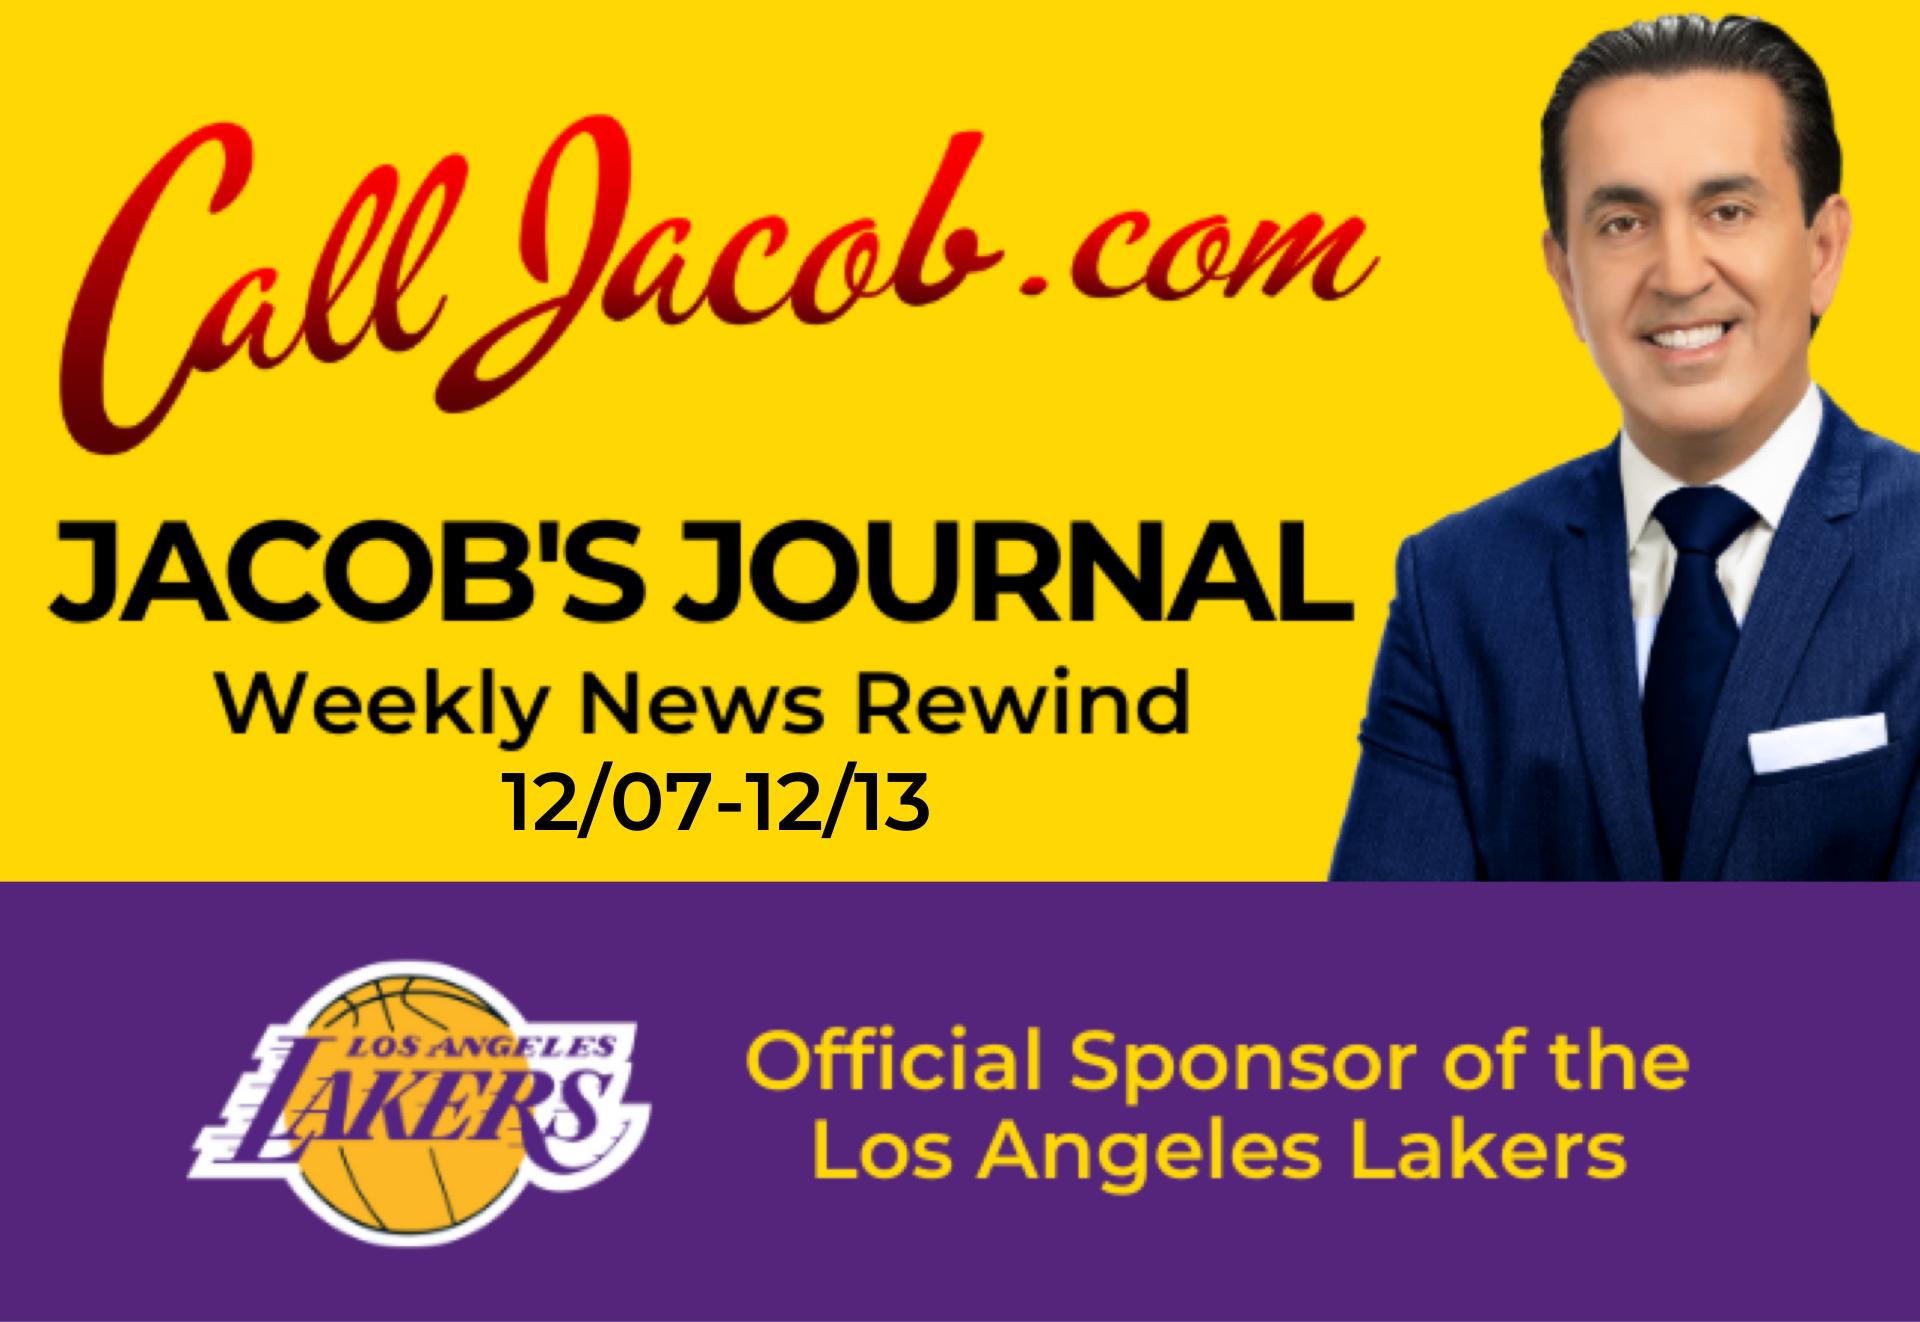 JacobsJournalWeeklyNewsRewind-12-07_12-13